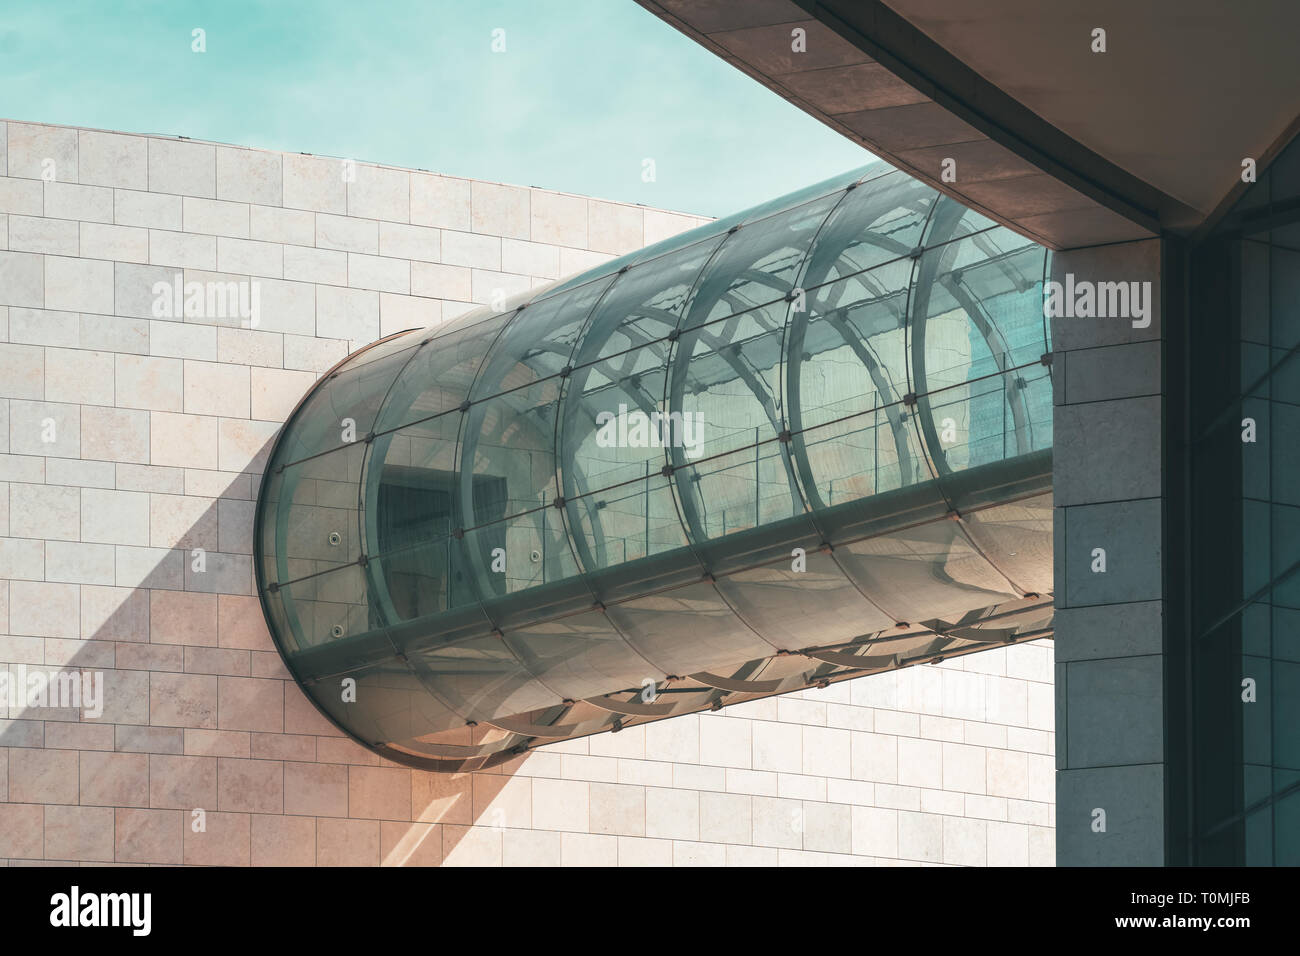 LISBON, PORTUGAL - AUGUST 25, 2017: Minimalist Glass Tunnel